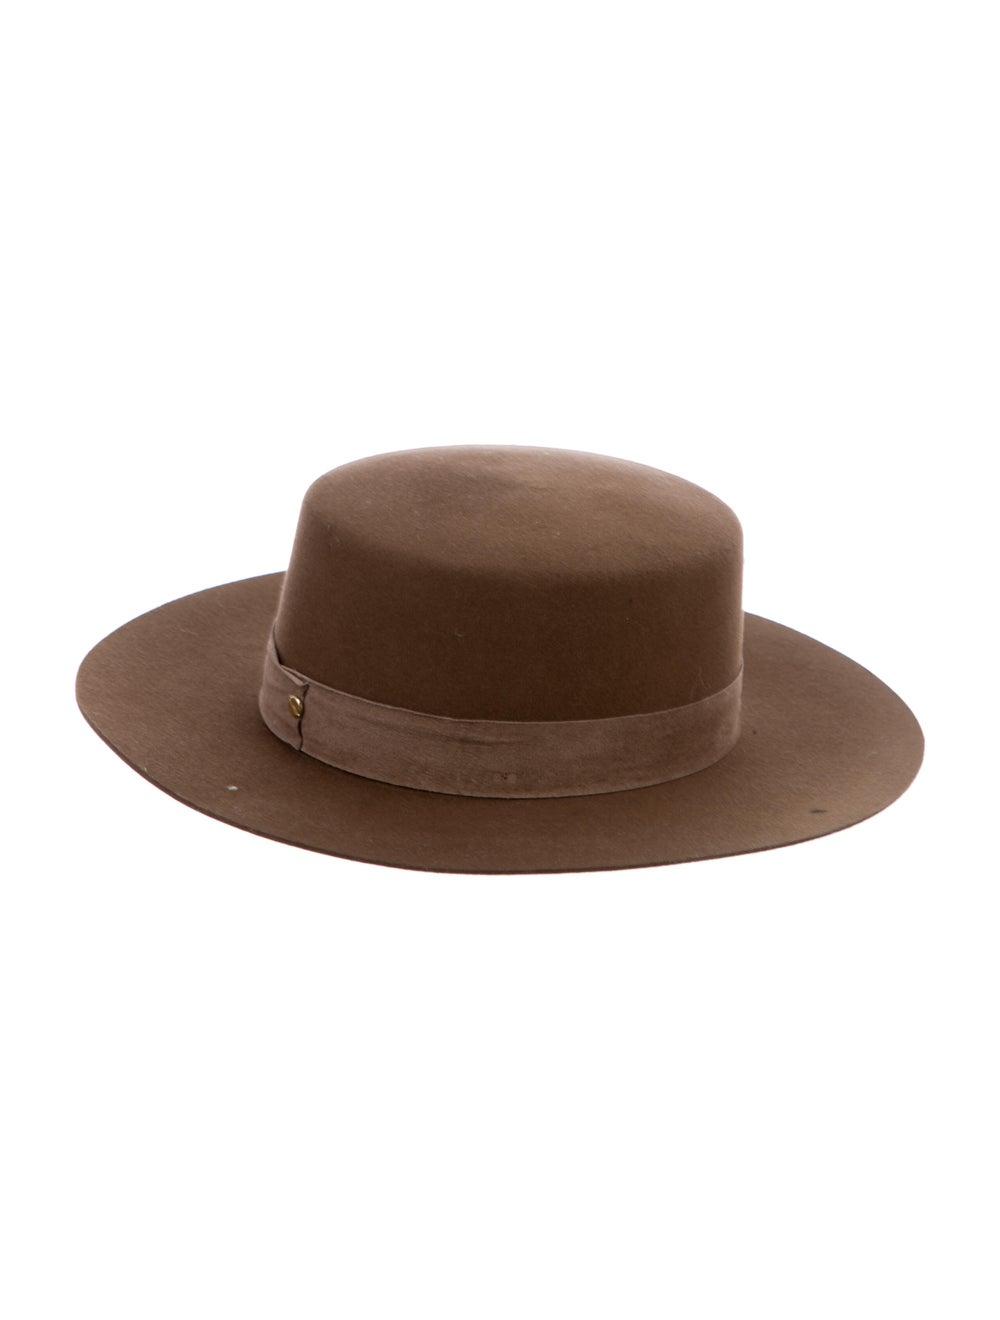 Janessa Leone Fur Felt Fedora Hat Tan - image 2